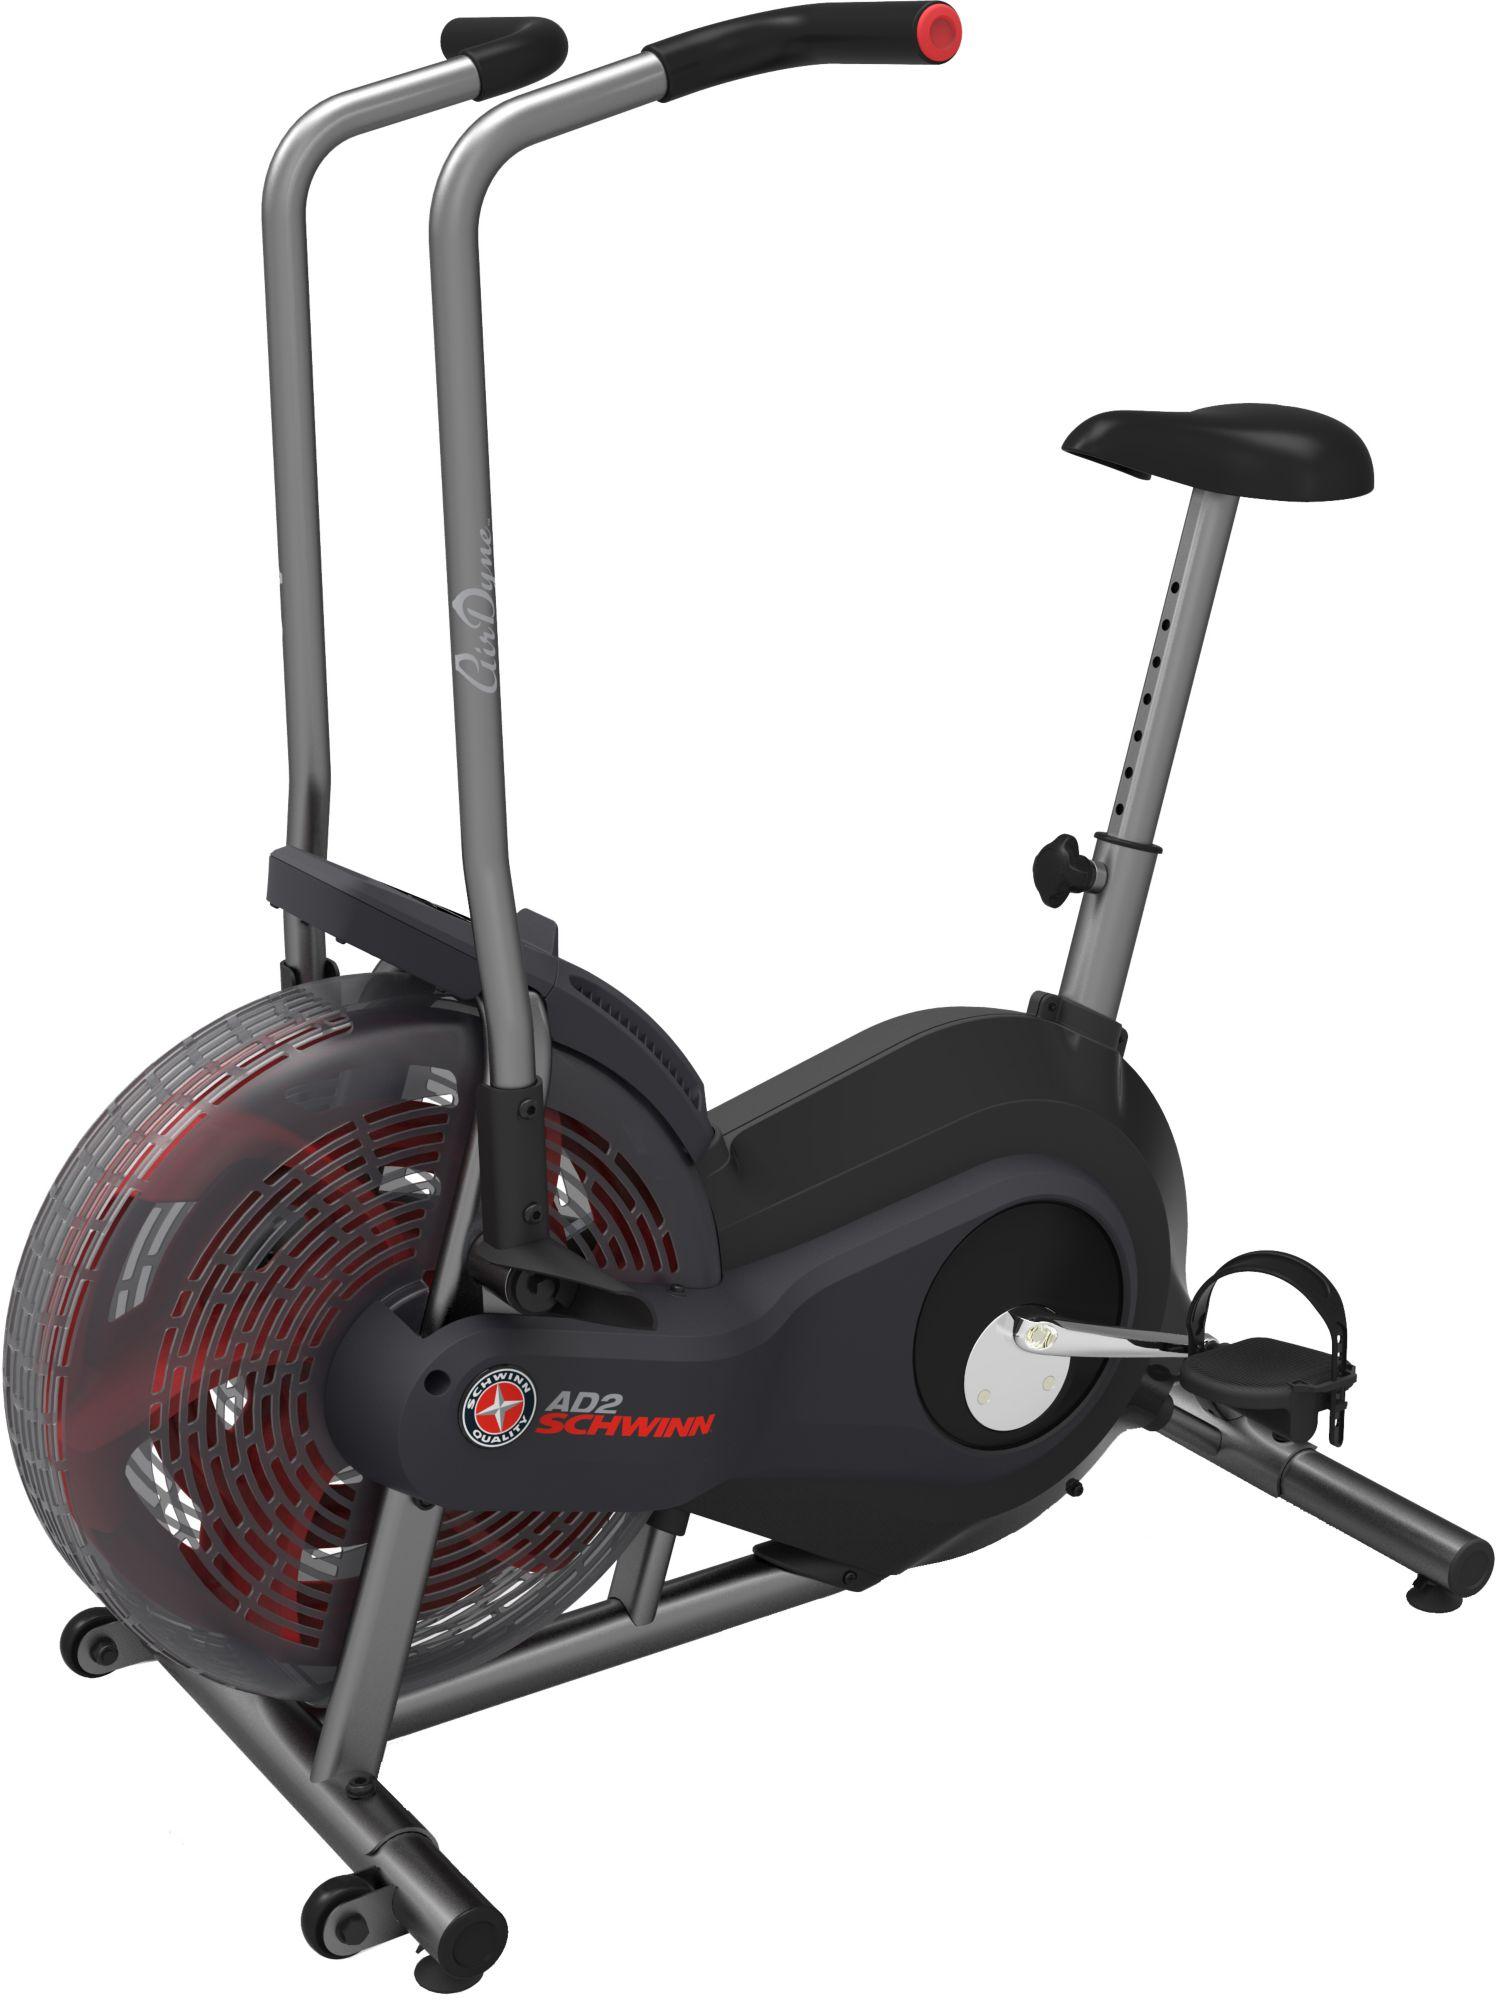 Schwinn Airdyne Ad2 Upright Exercise Bike Dick S Sporting Goods